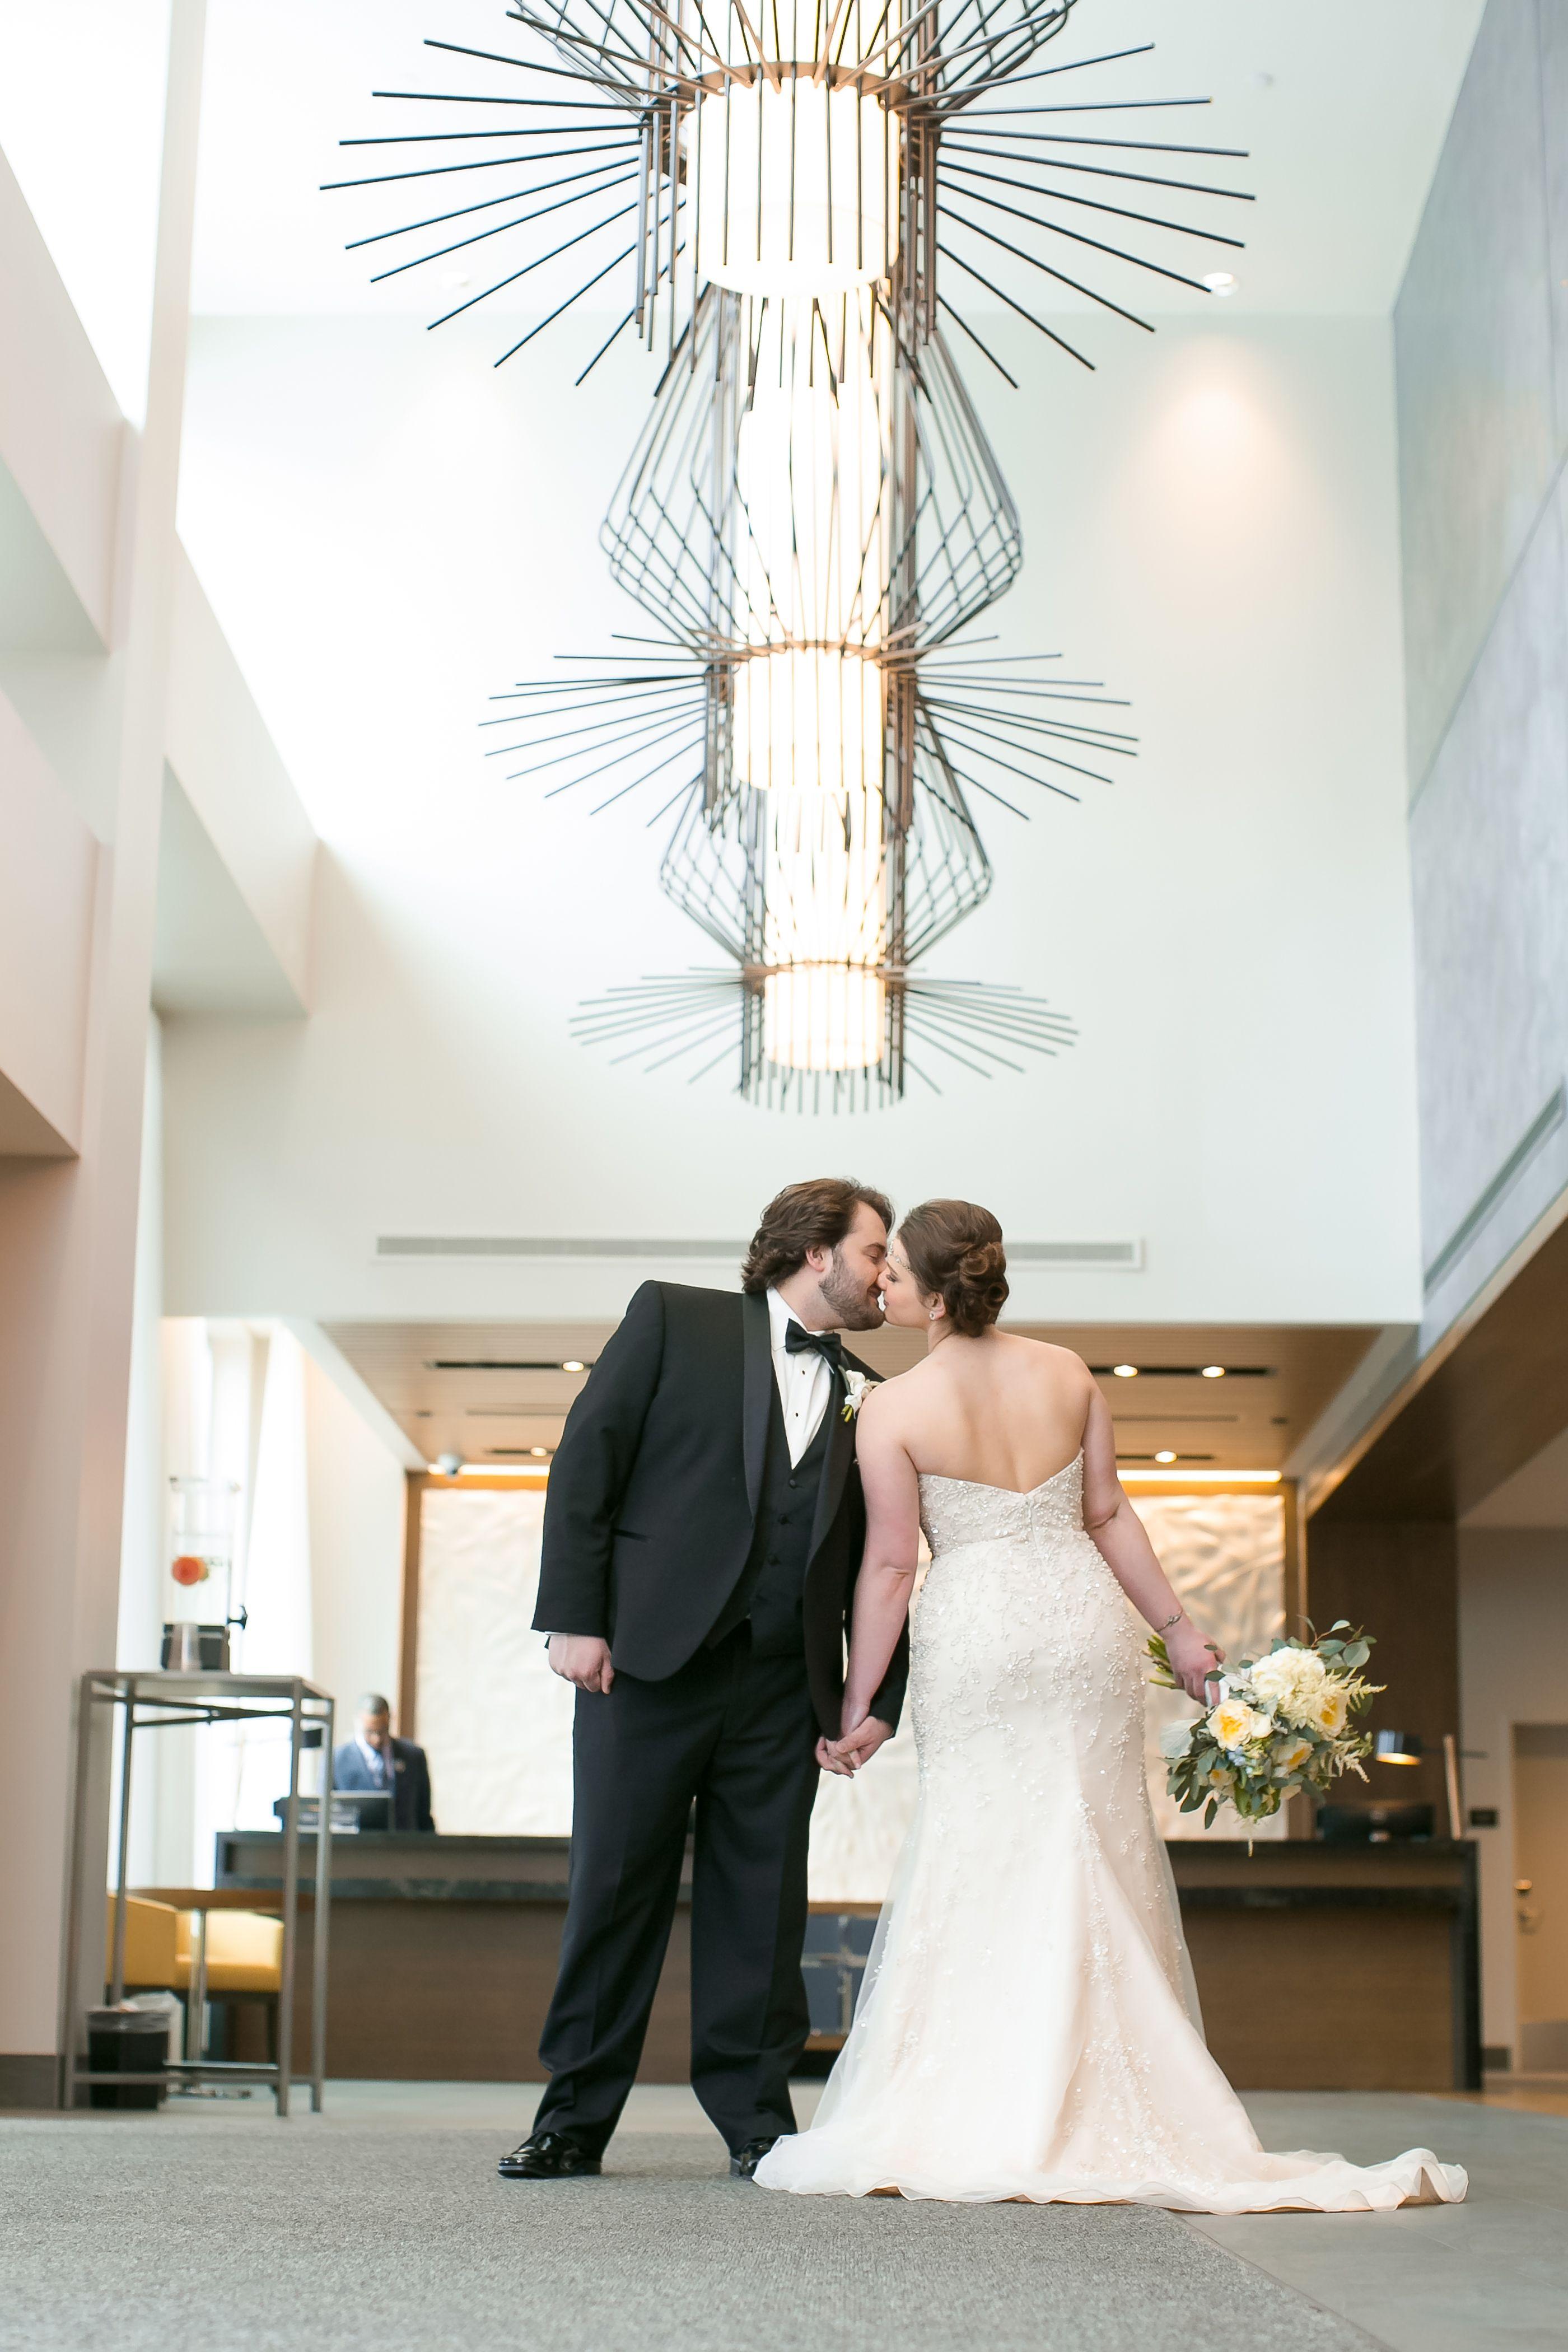 Hyatt Regency By Mall Of America Weddings Wedding Strapless Wedding Dress Event Space